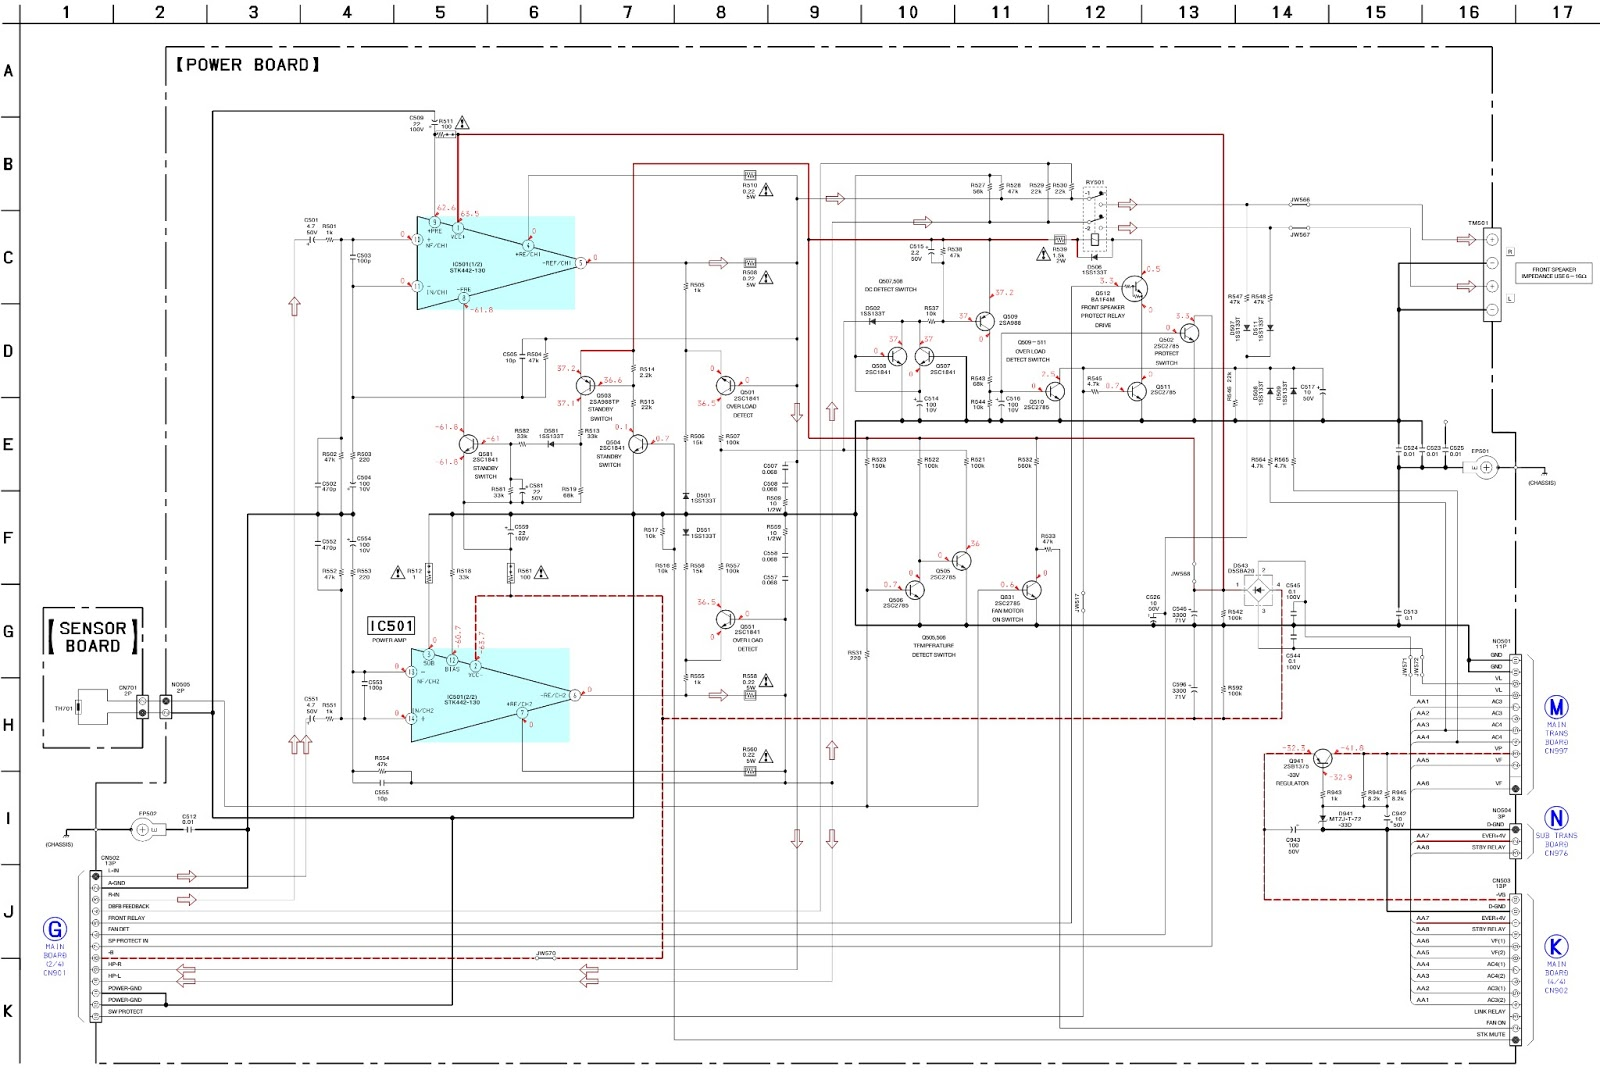 Circuit Diagram Of Stk Amplifier Index 29 Audio Seekiccom Images Sony Hcdrg66t 442130 Power Amp Supply Schematics